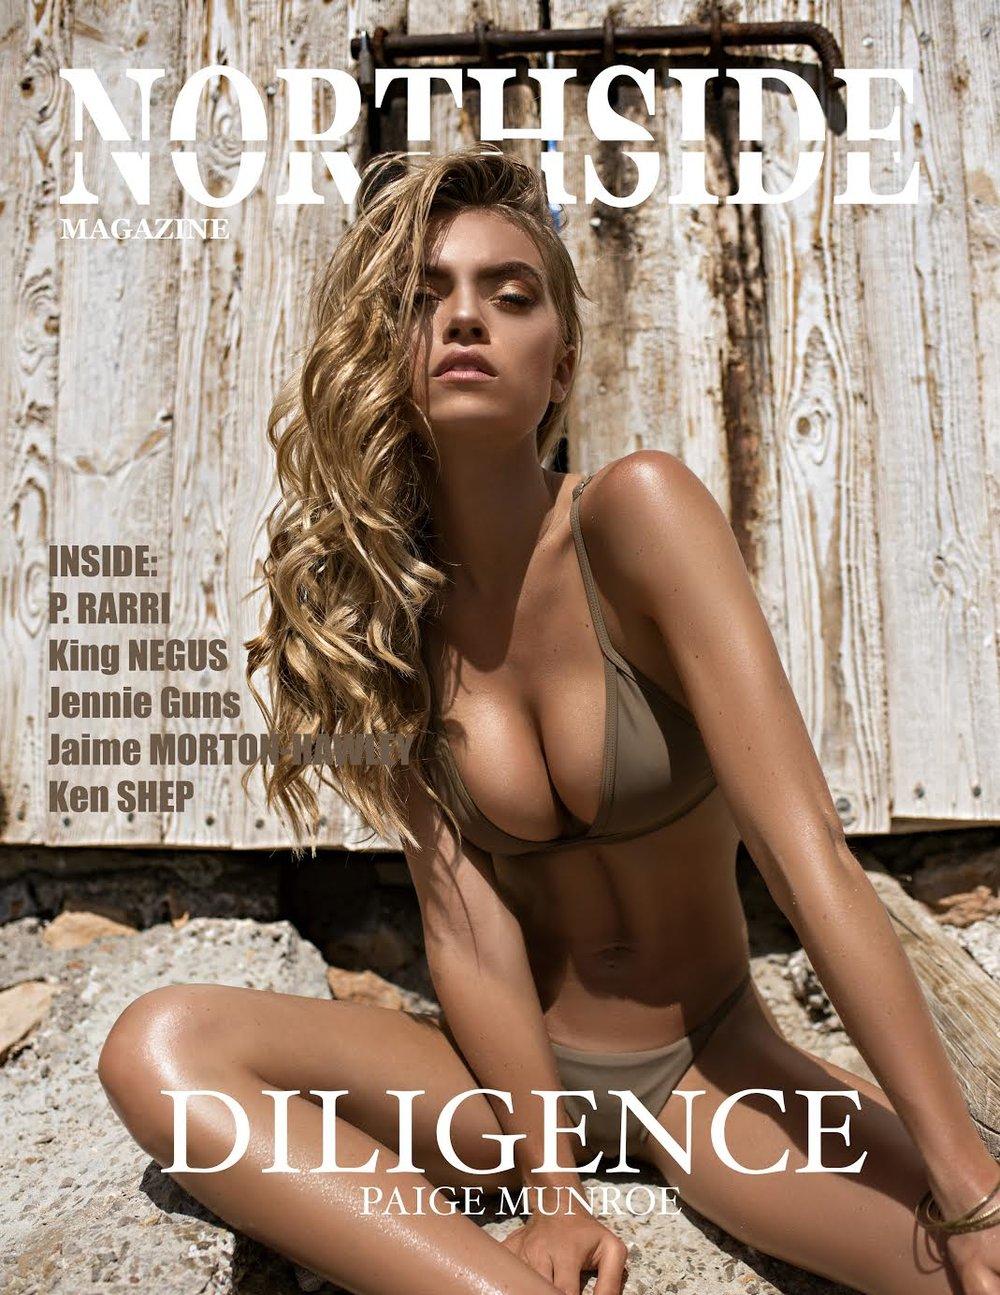 Northside+Magazine+Vol+20+Paige+Munroe.jpeg